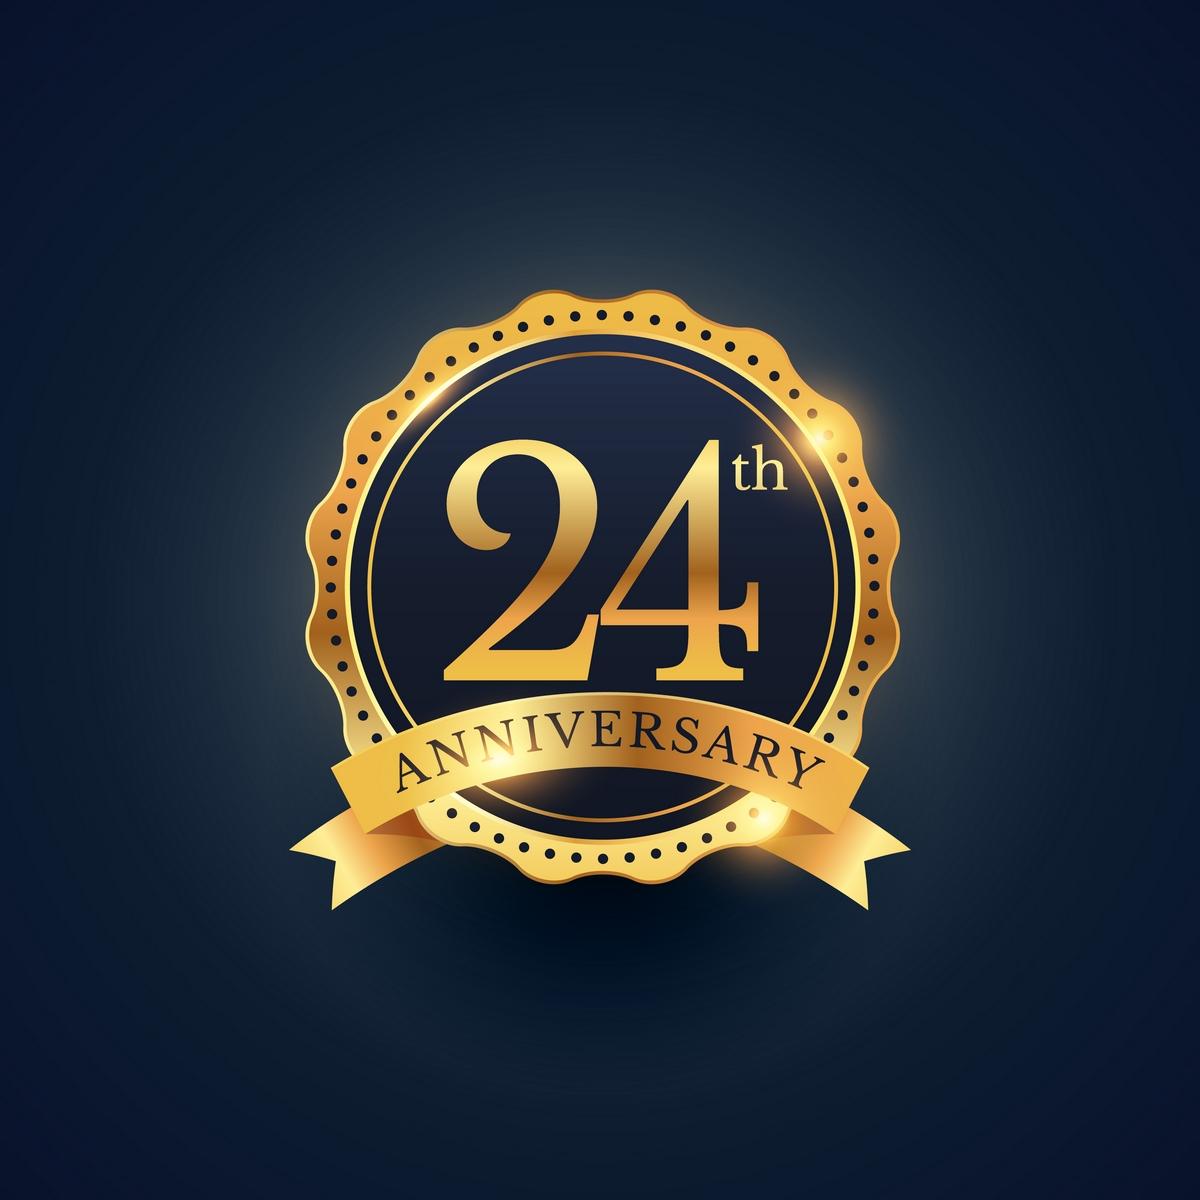 24th anniversary celebration badge label in golden color